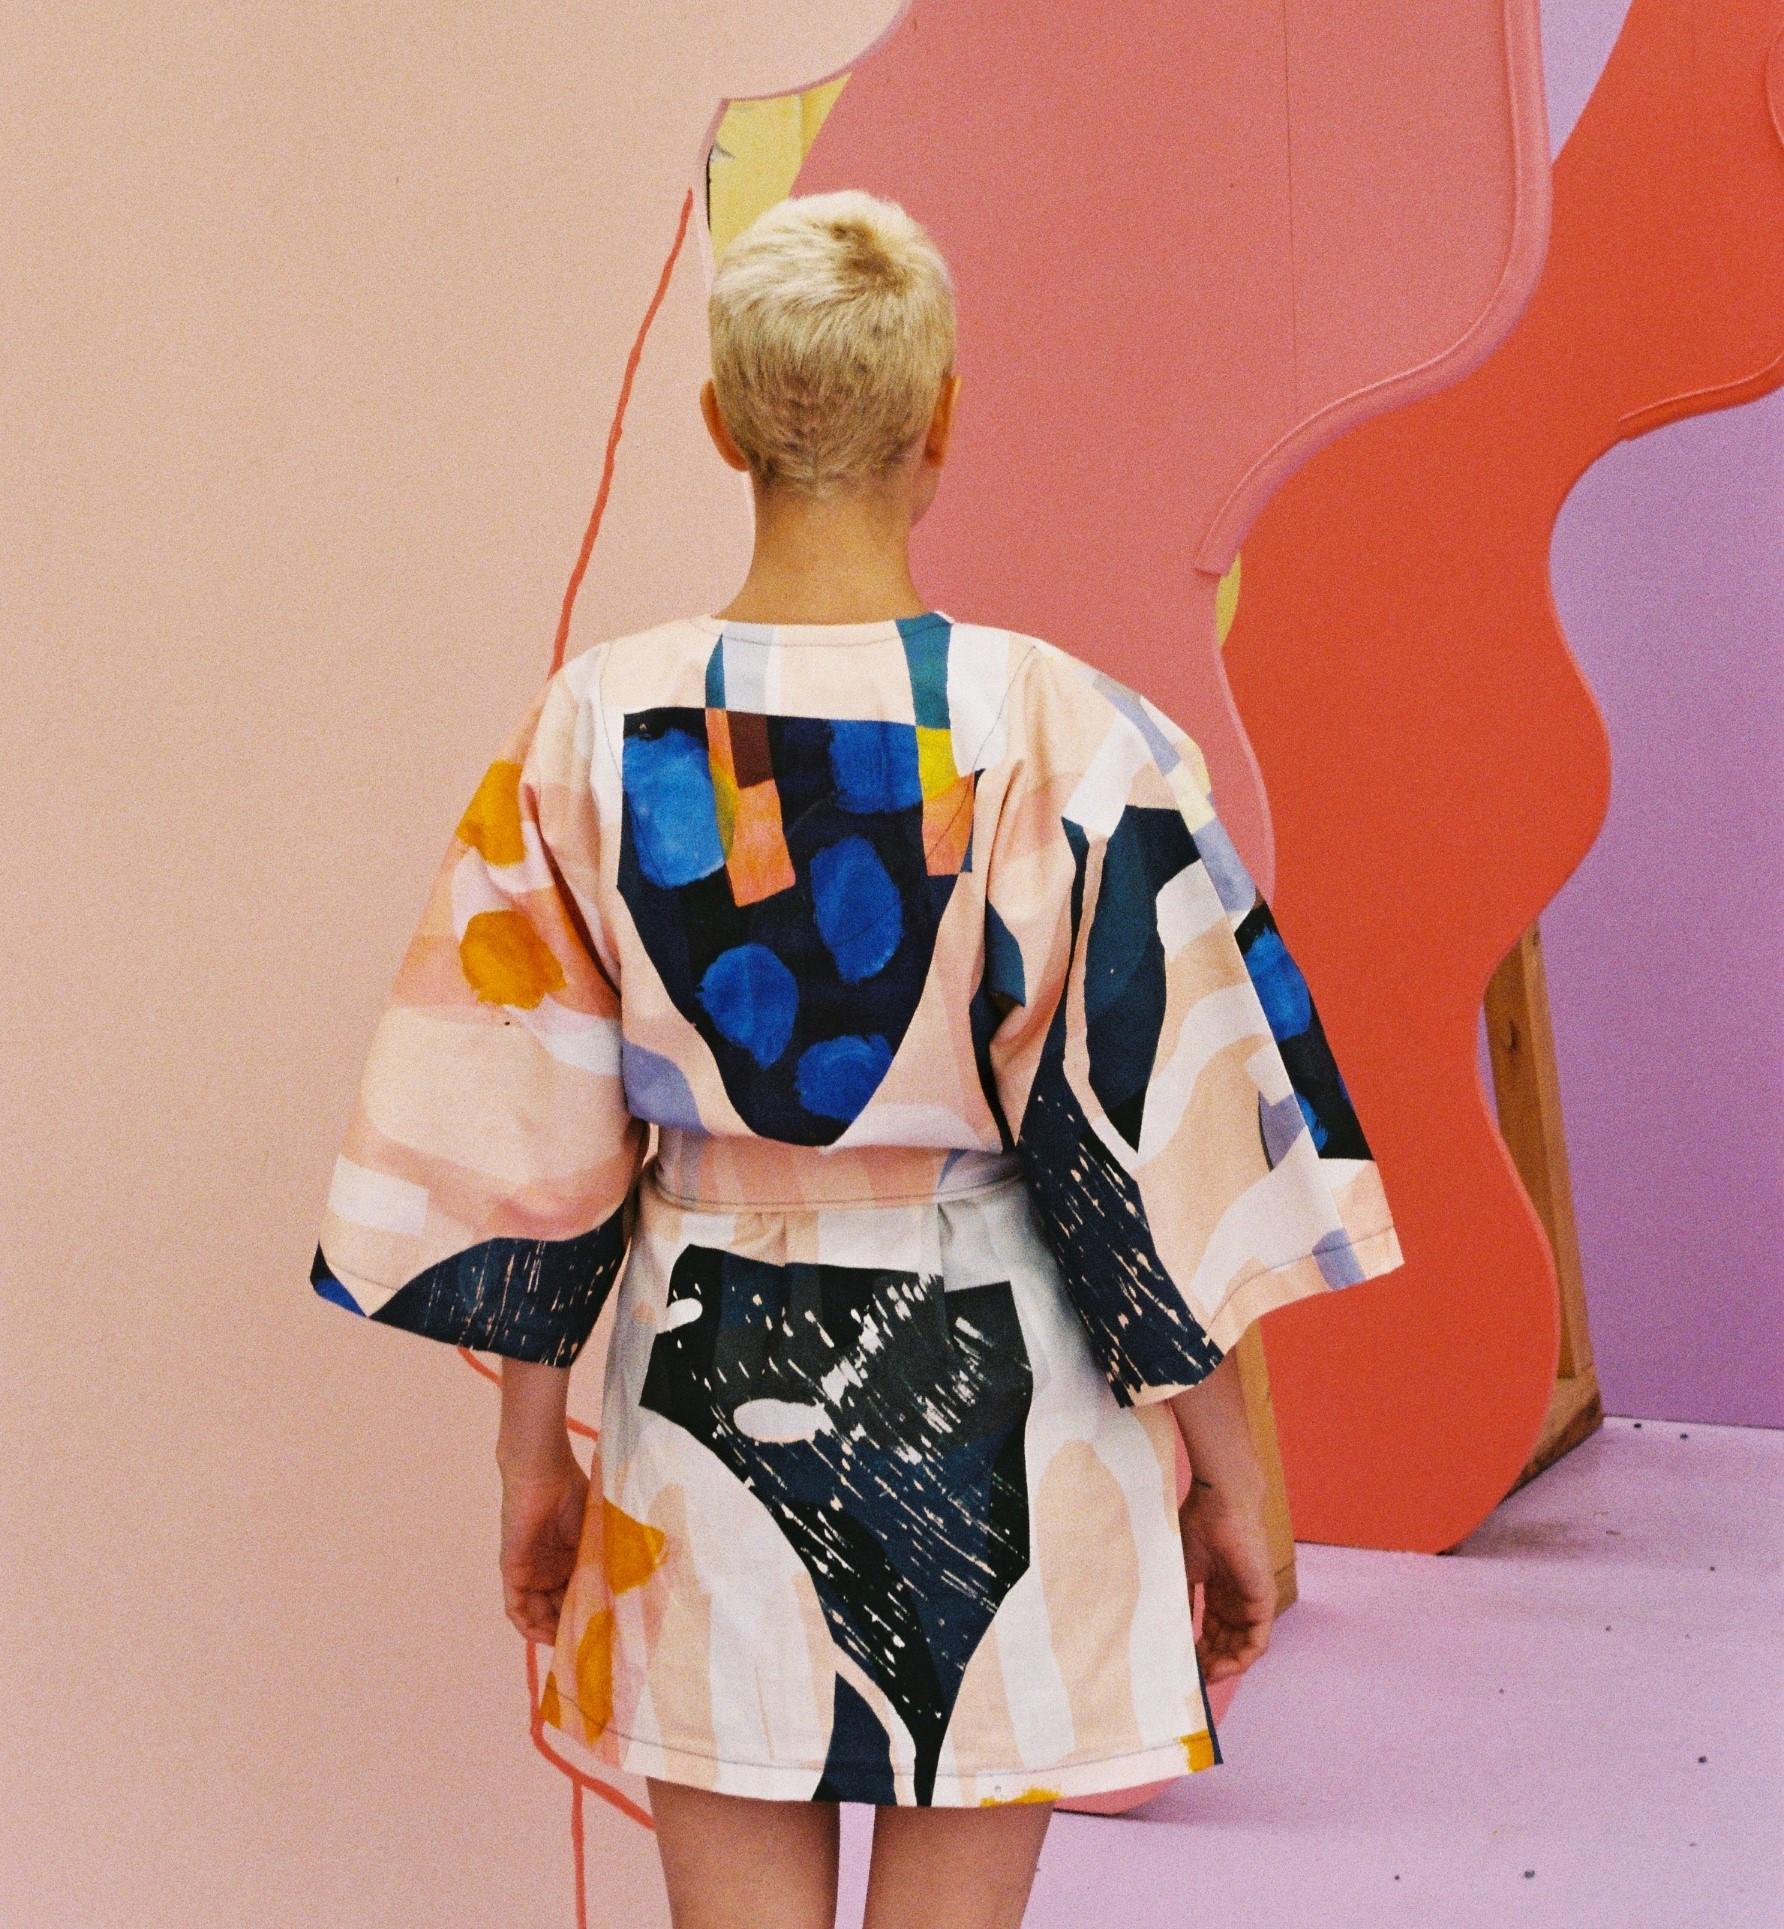 kimono sthlm ruth_resized_20181030_094744342 square.jpg